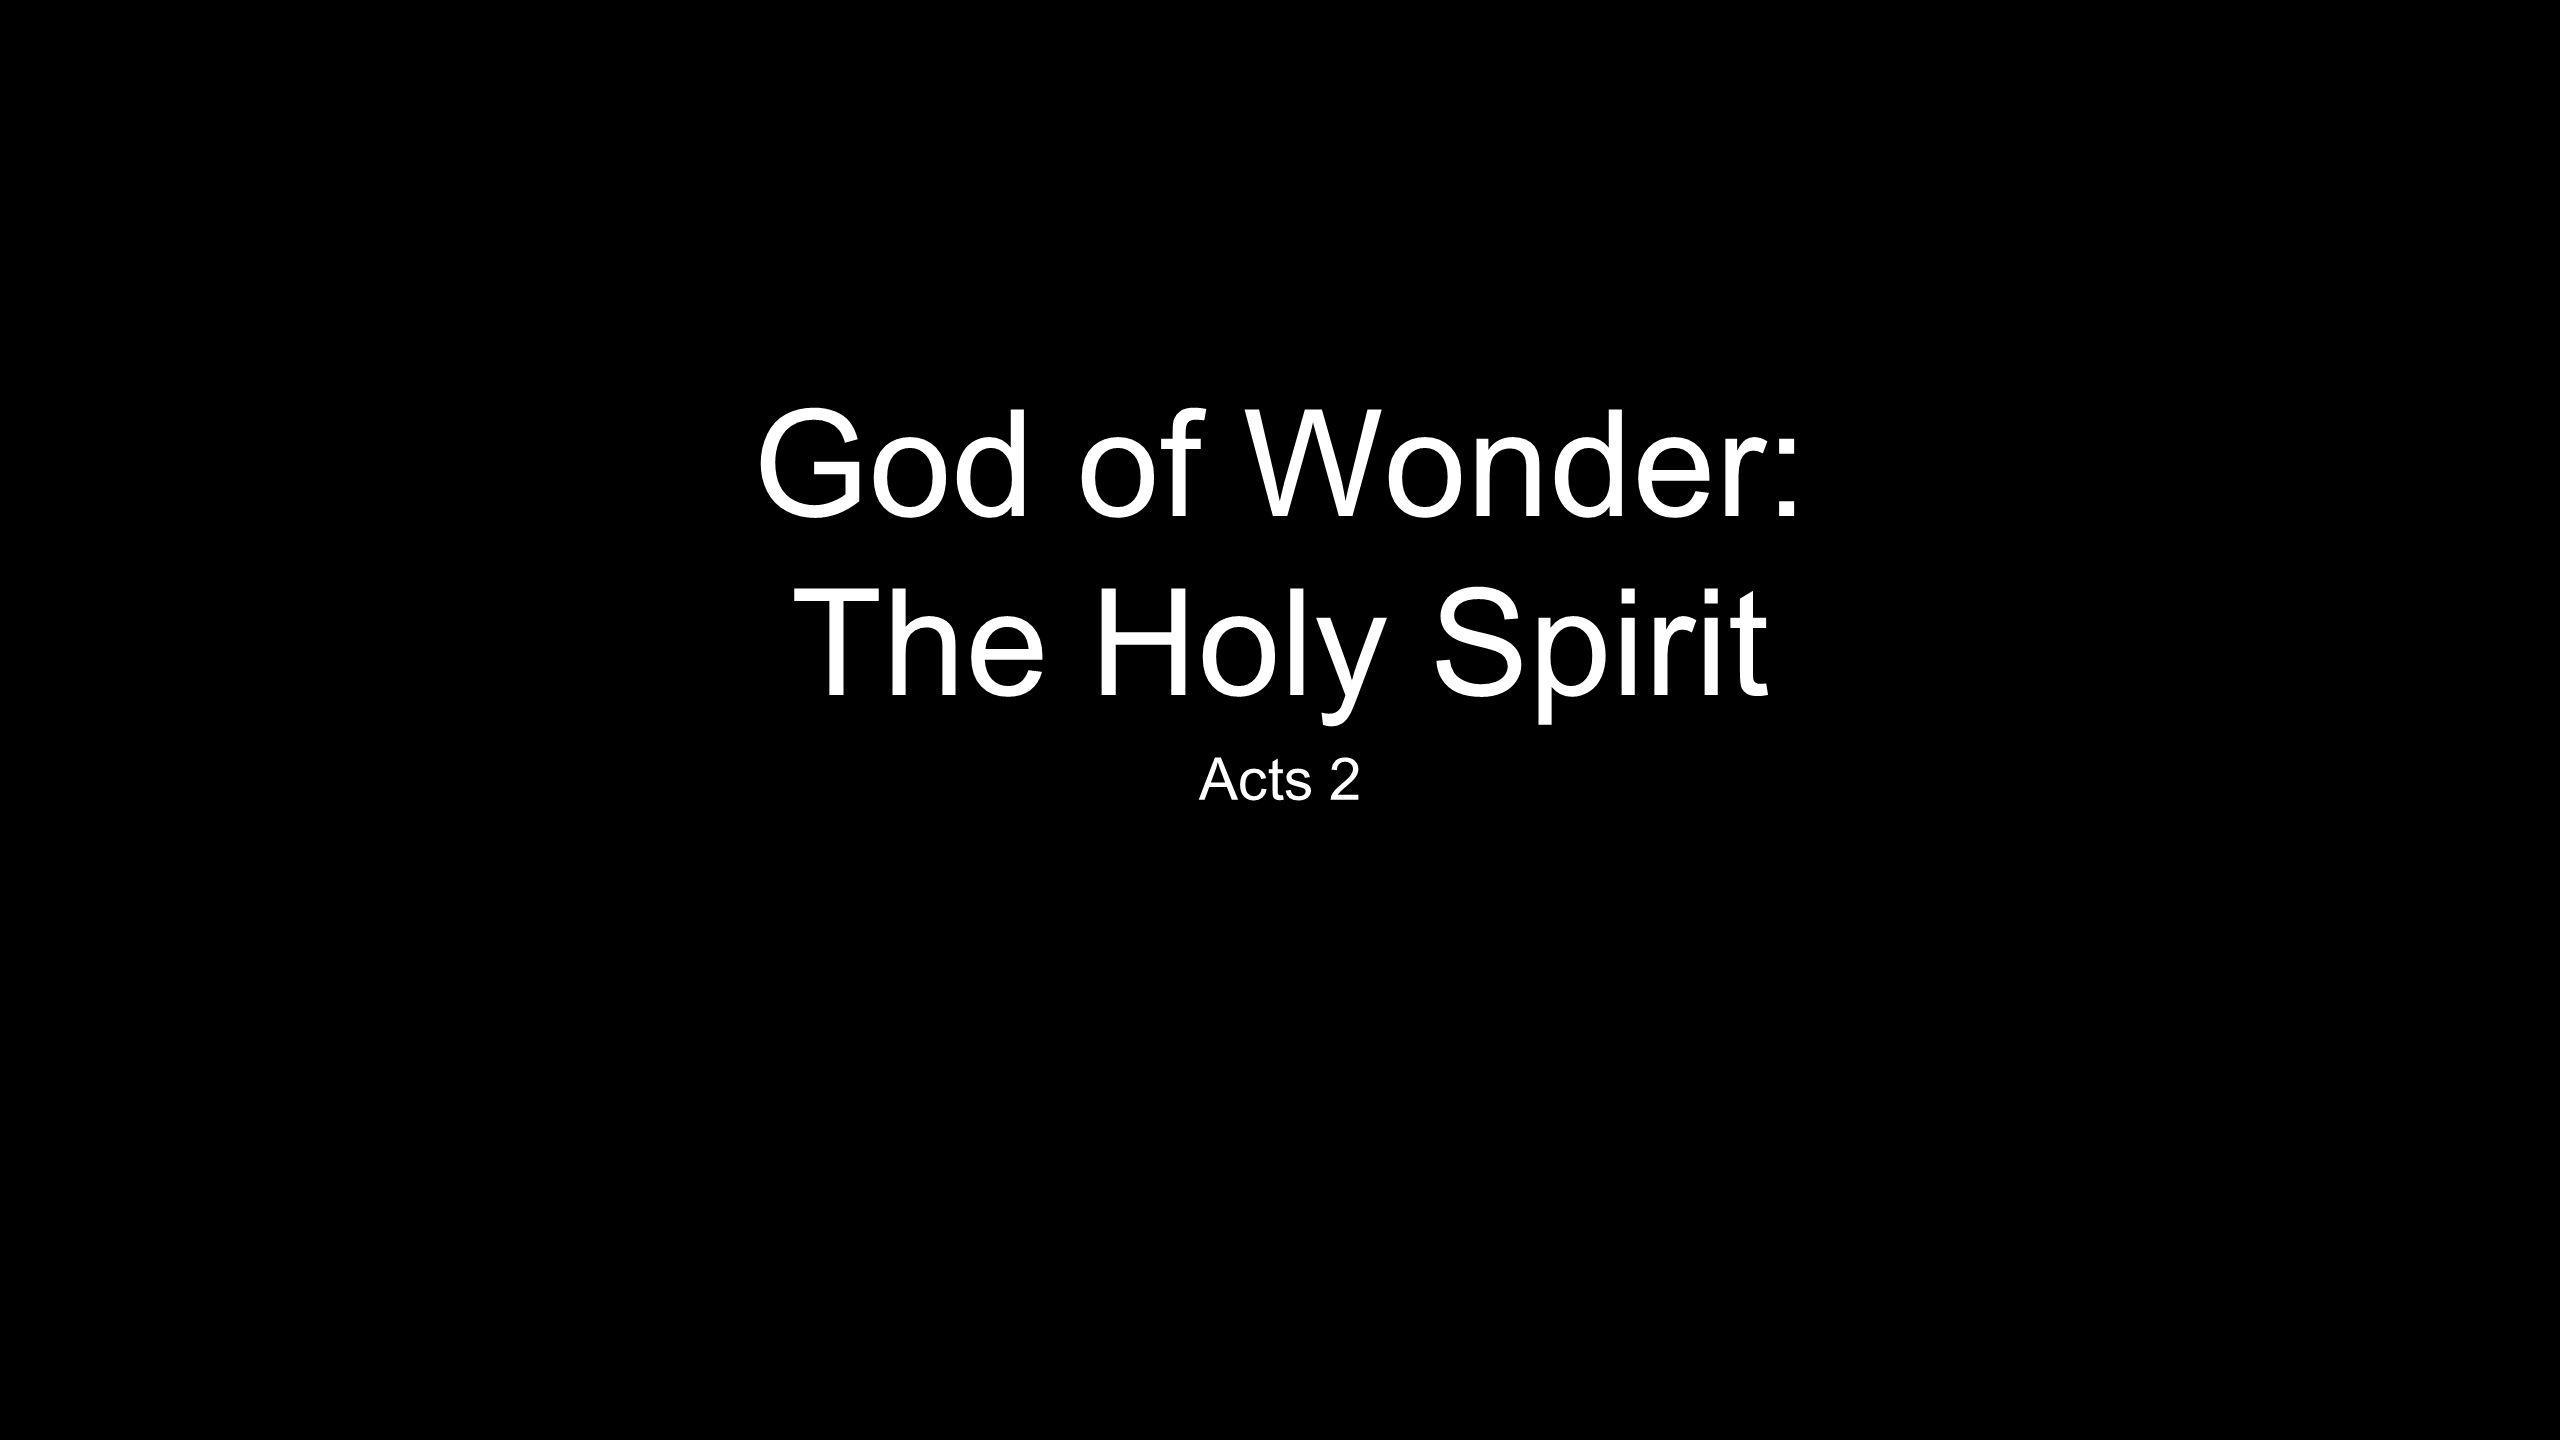 God of Wonder: The Holy Spirit